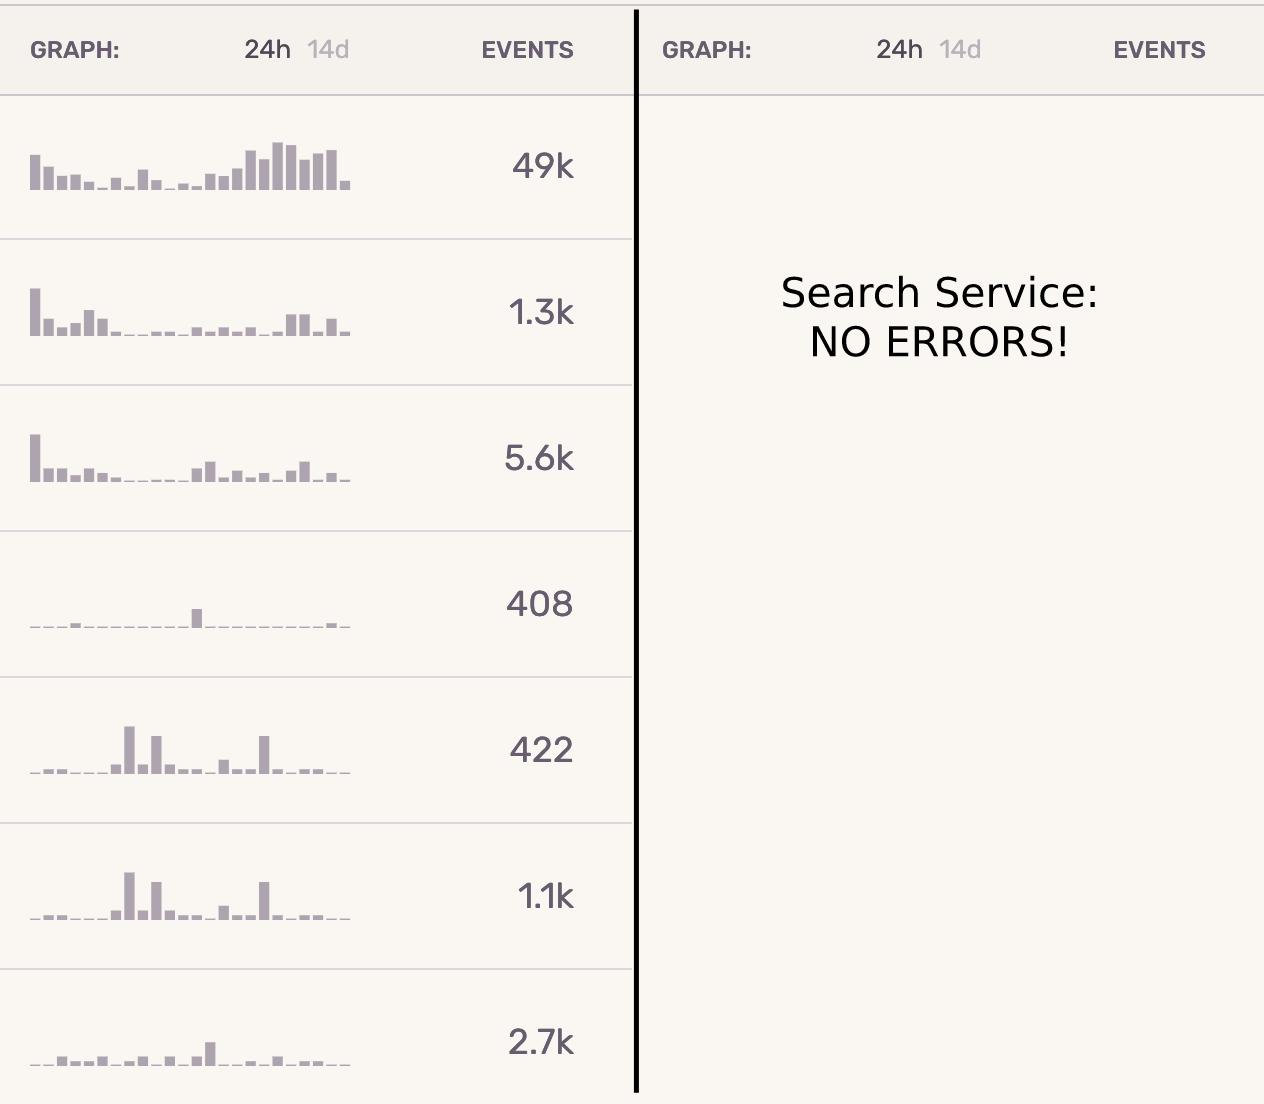 Errors in the vehicle-service vs search-service